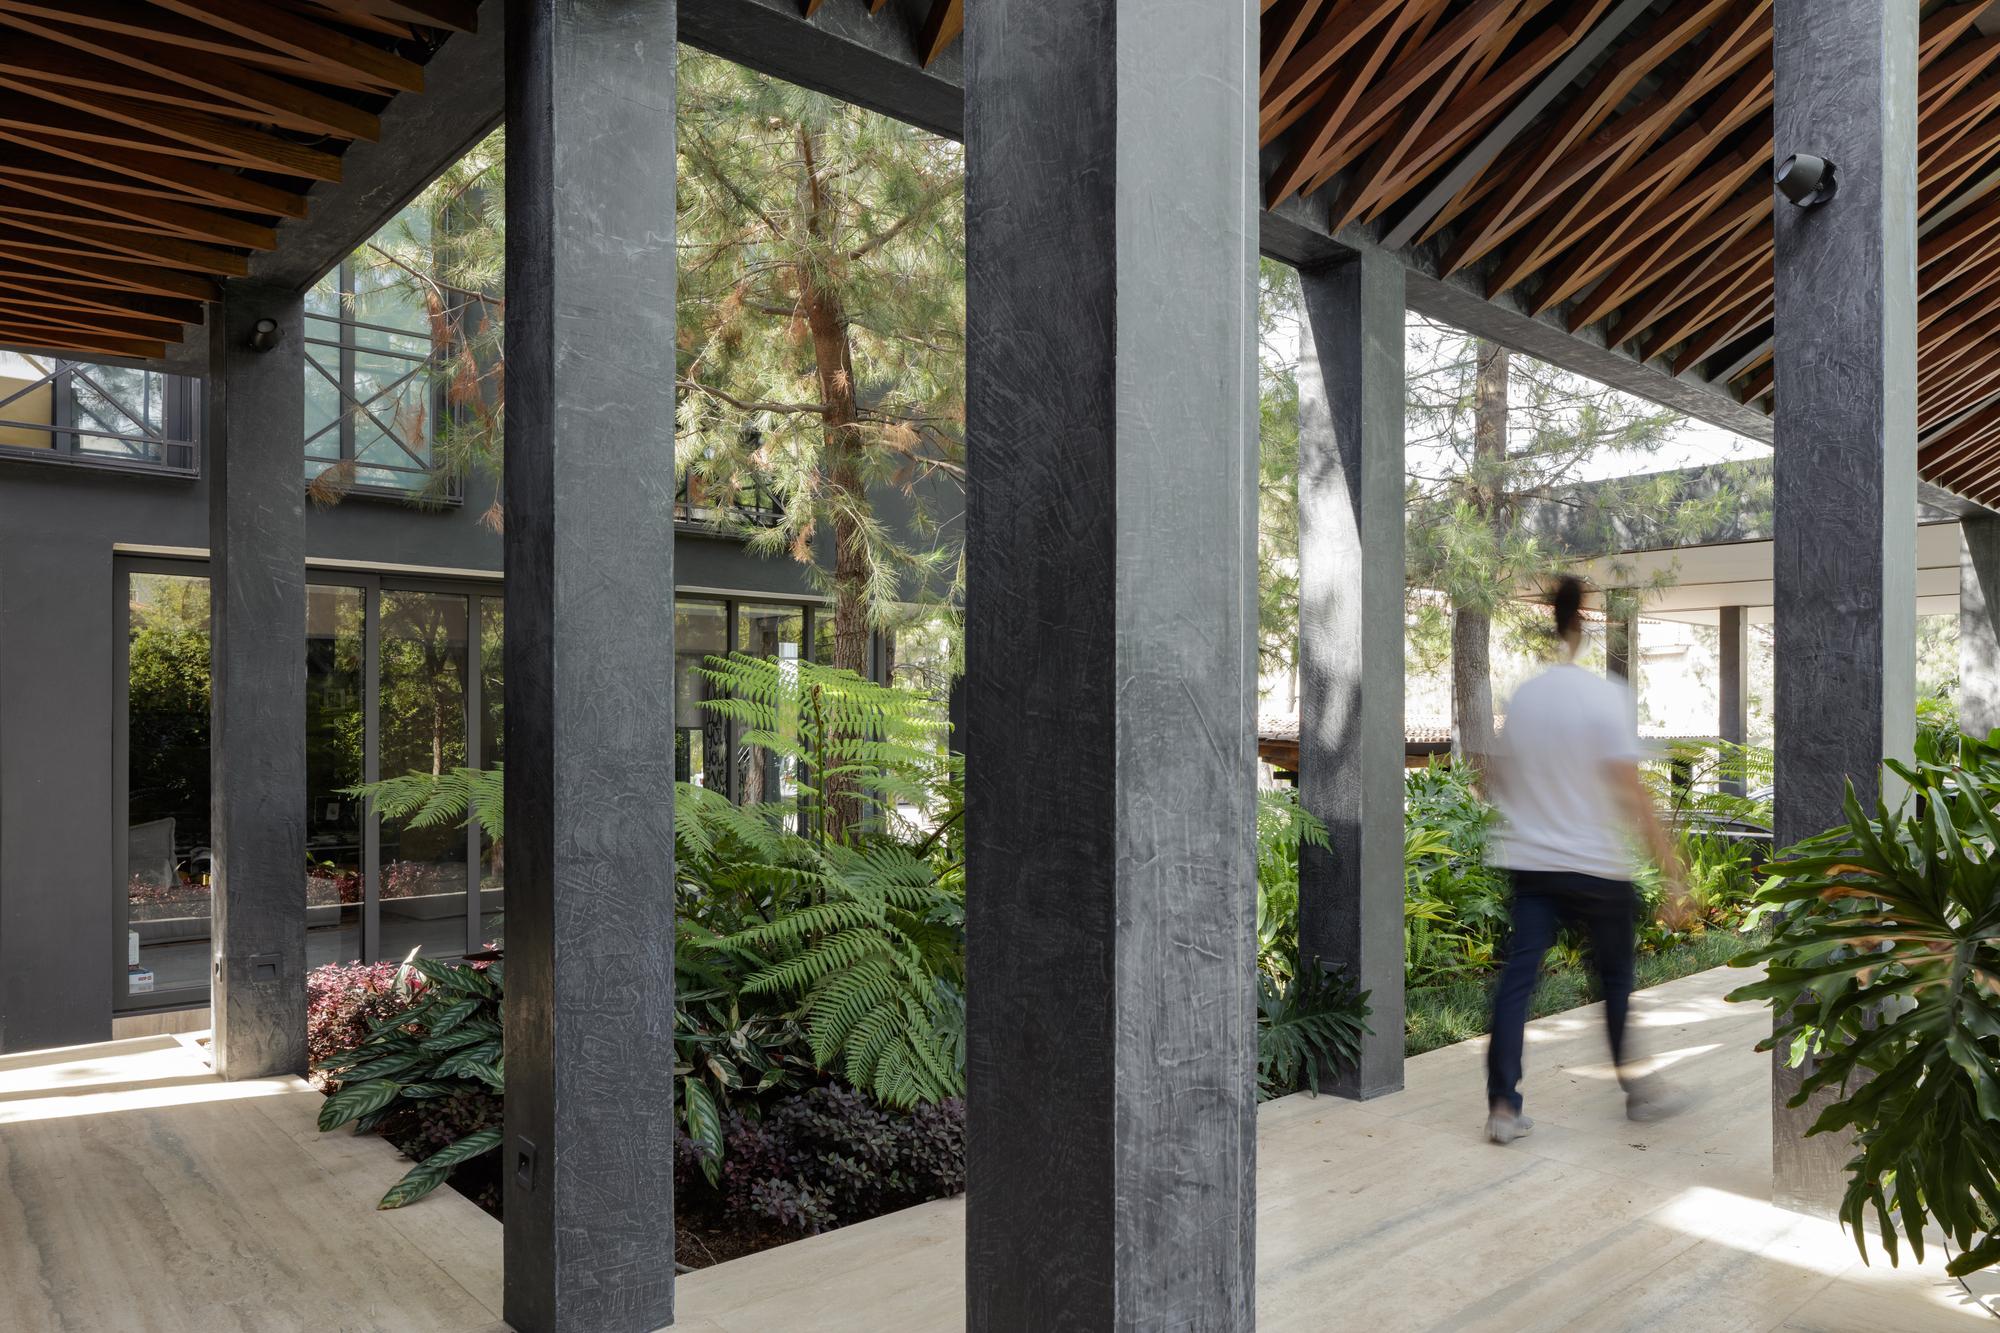 Gallery of Three Garden House / Taller de Diseño Exterior y Arquitectura - 1